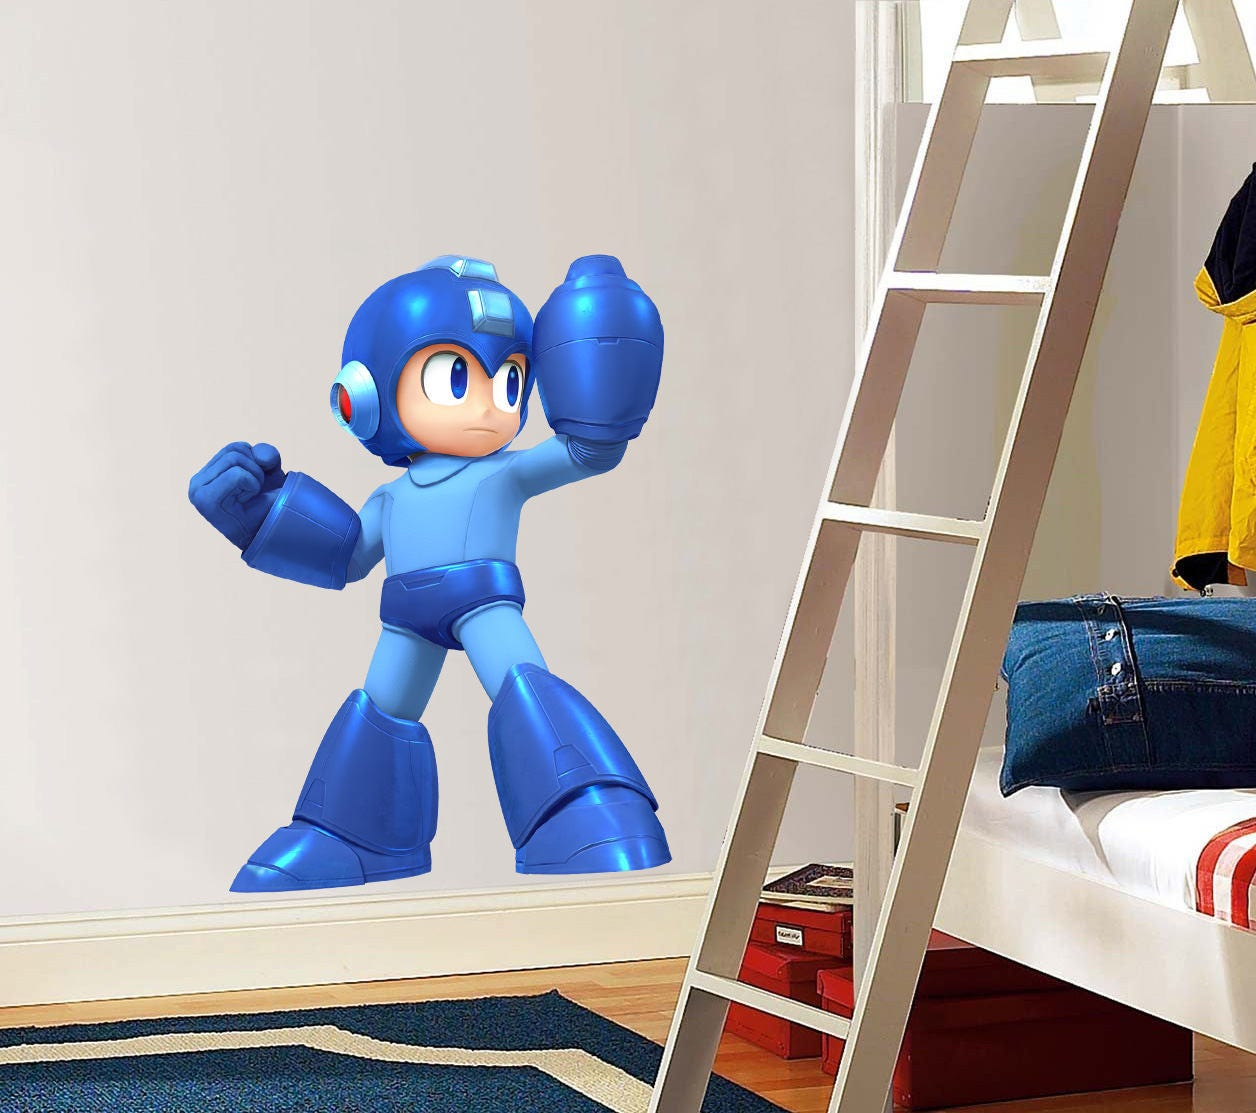 Mega man decal removable wall sticker decor art megaman video game mega man decal removable wall sticker decor art megaman video game room kids amipublicfo Choice Image